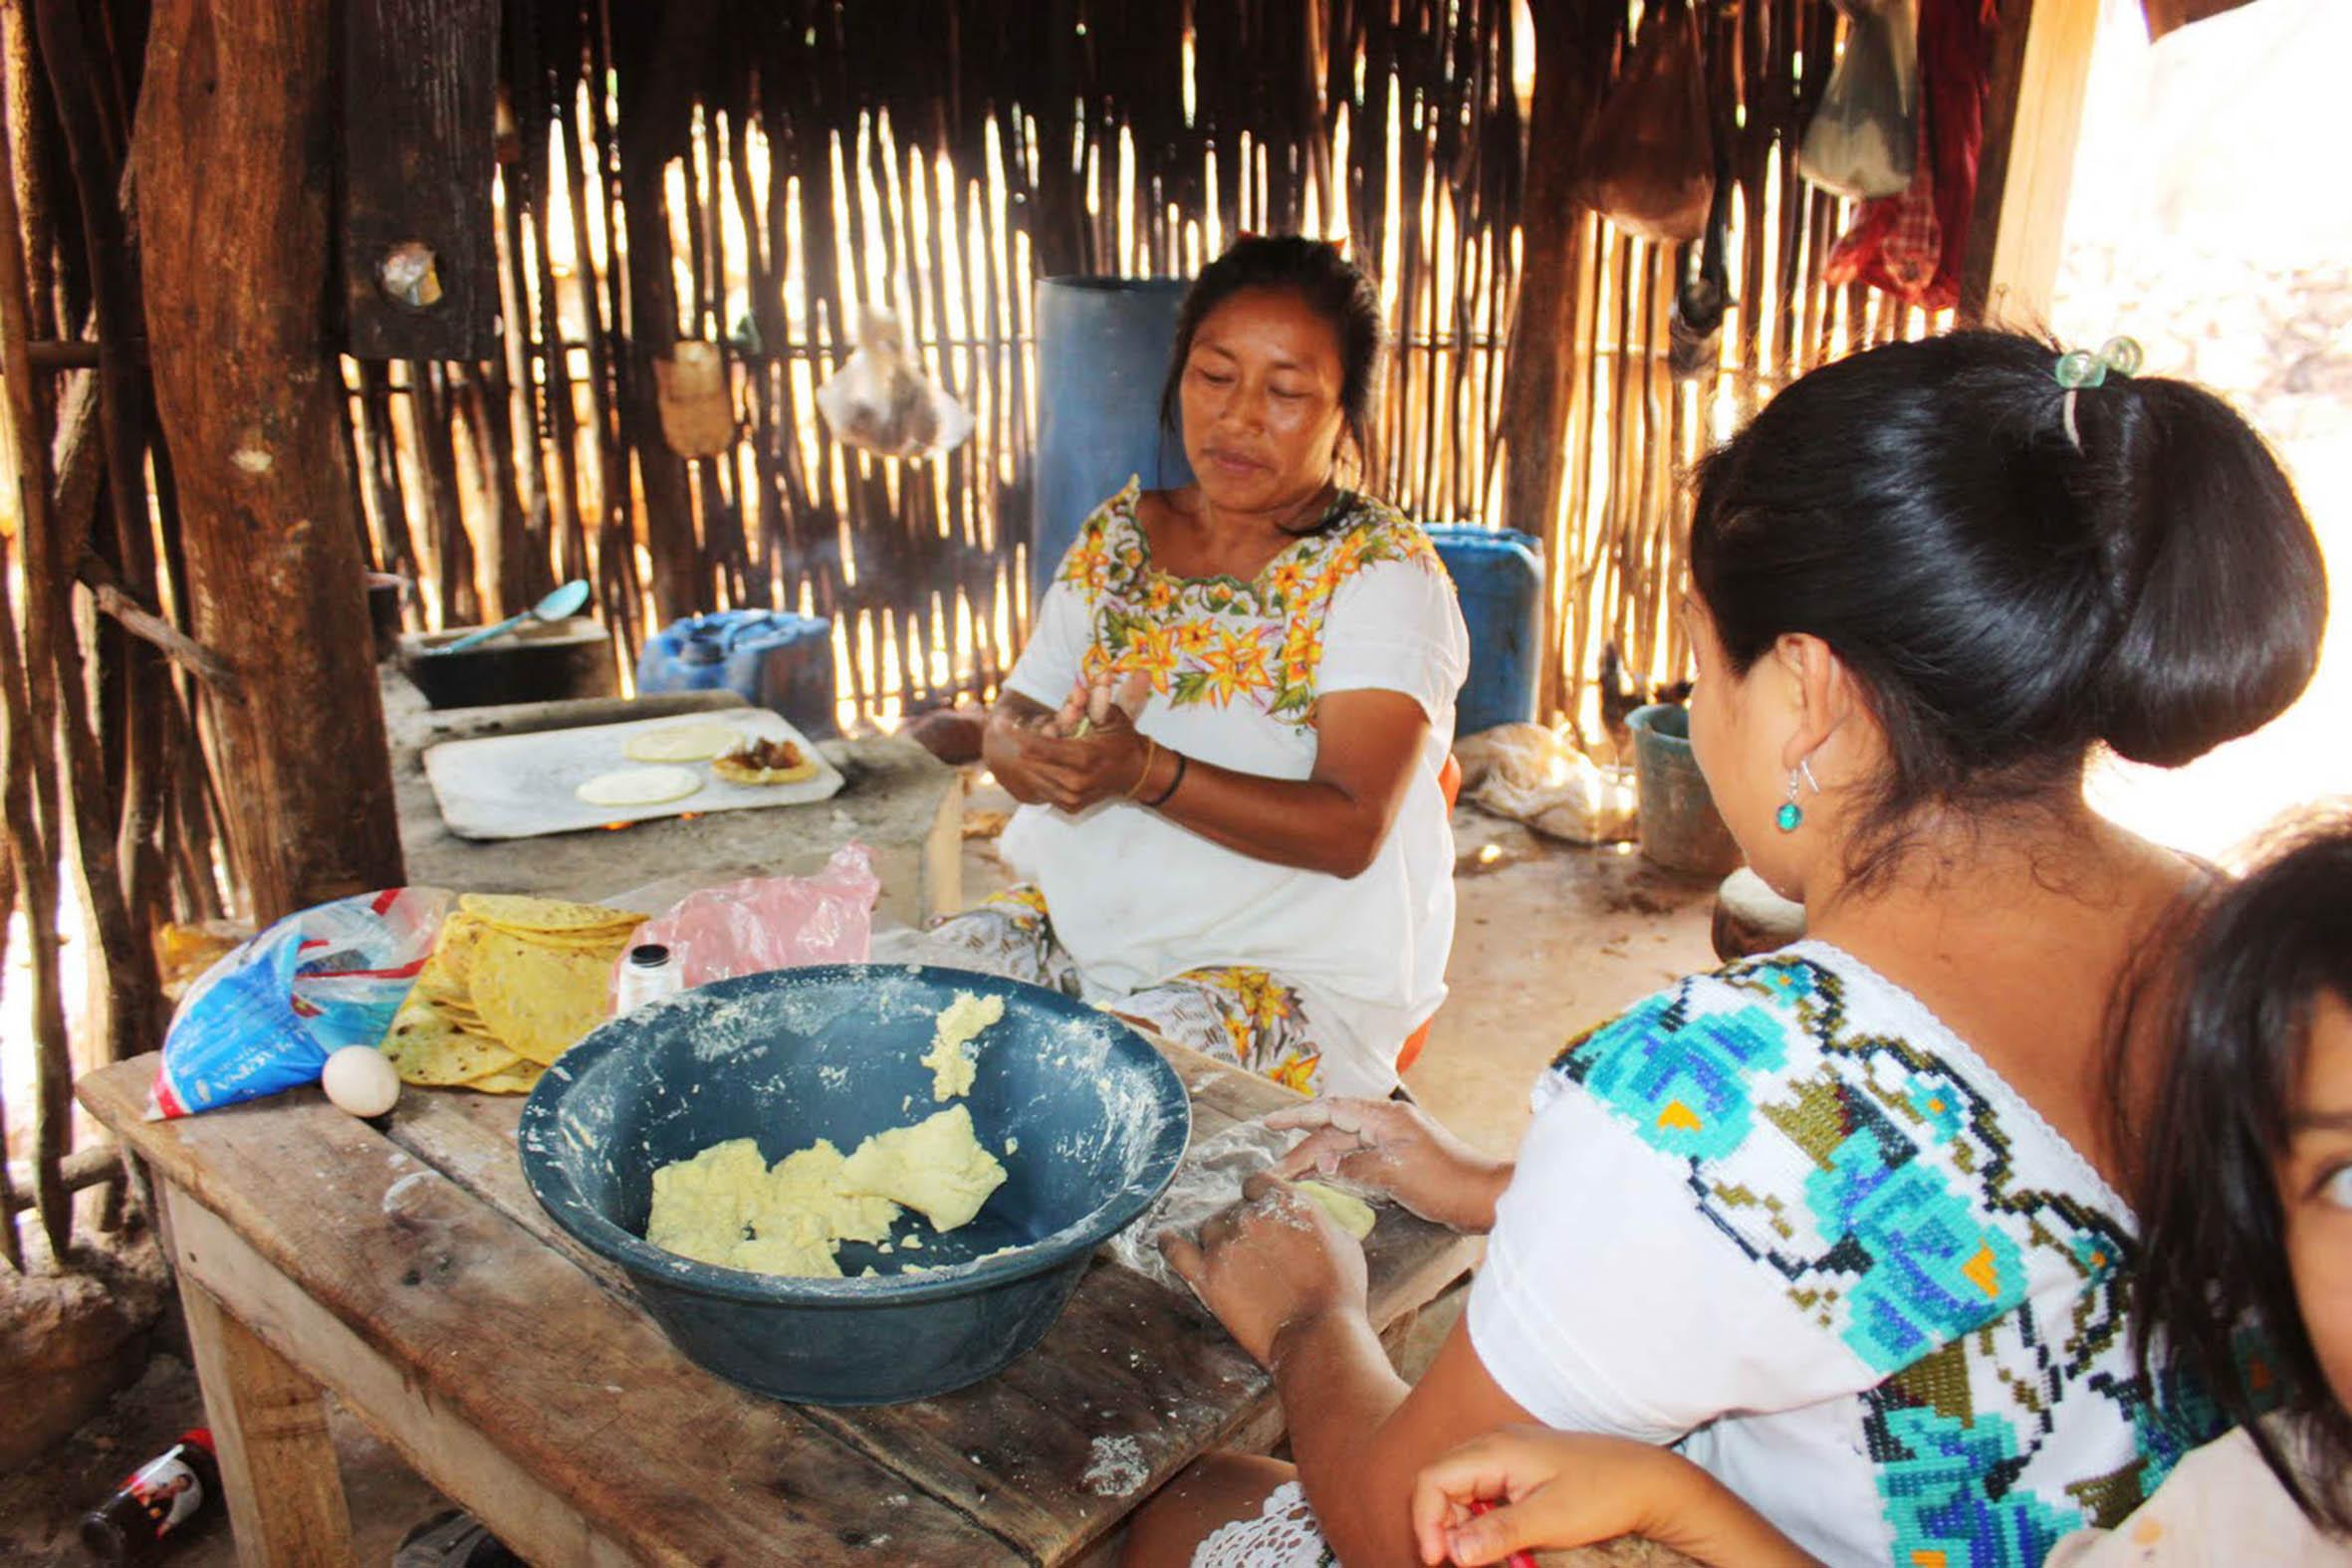 Abuela brasileira de nuevo - 2 part 1